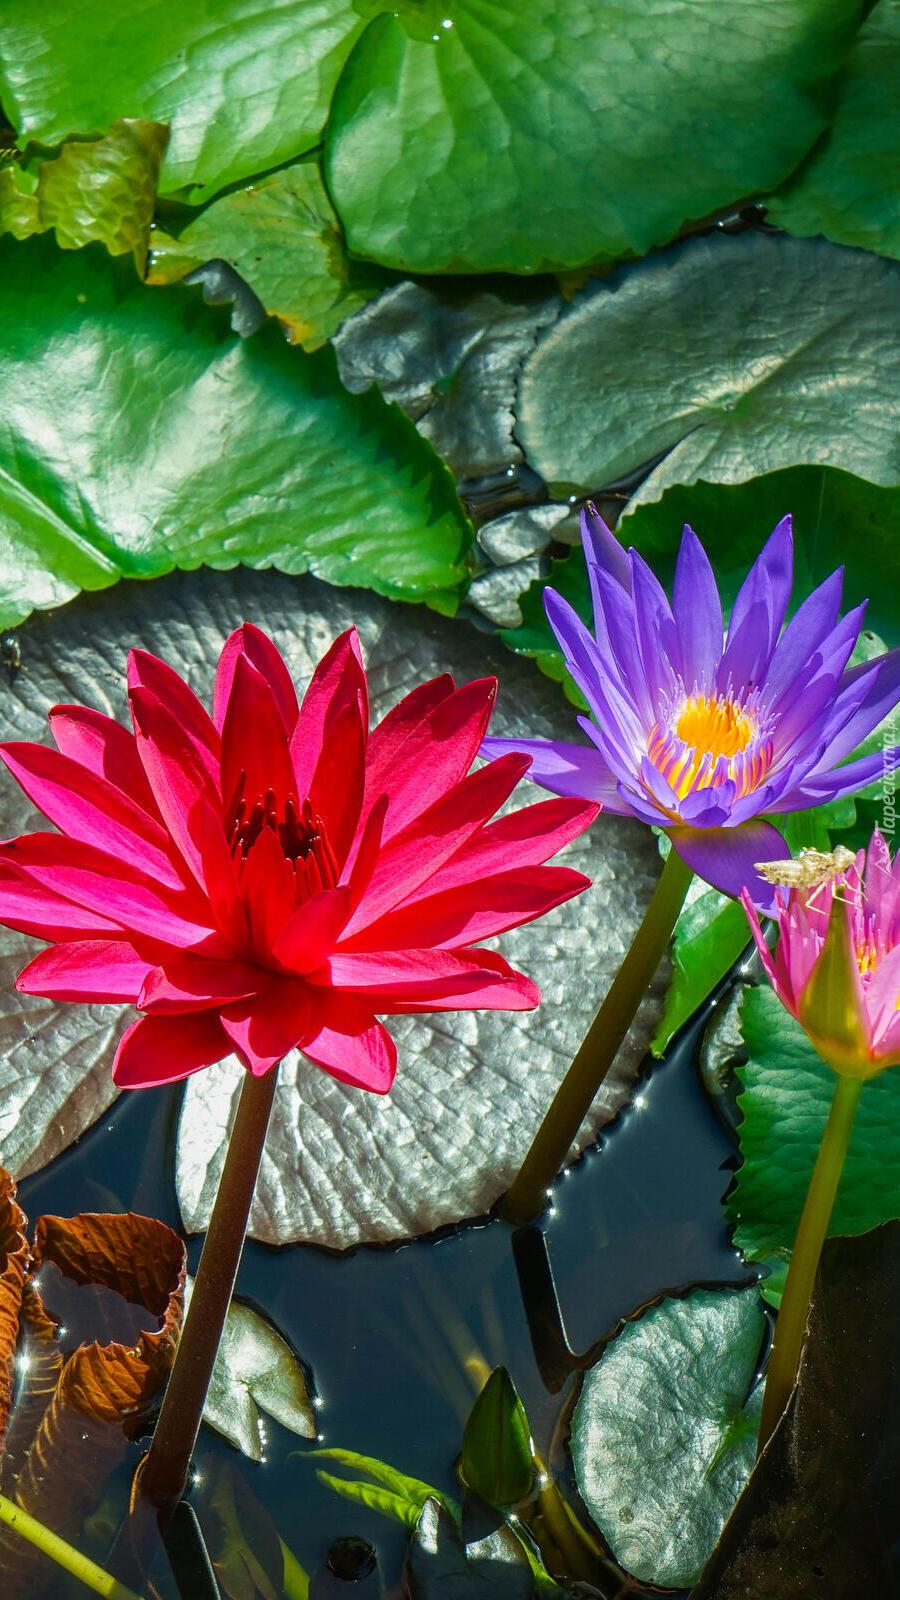 Kolorowe lilie wodne